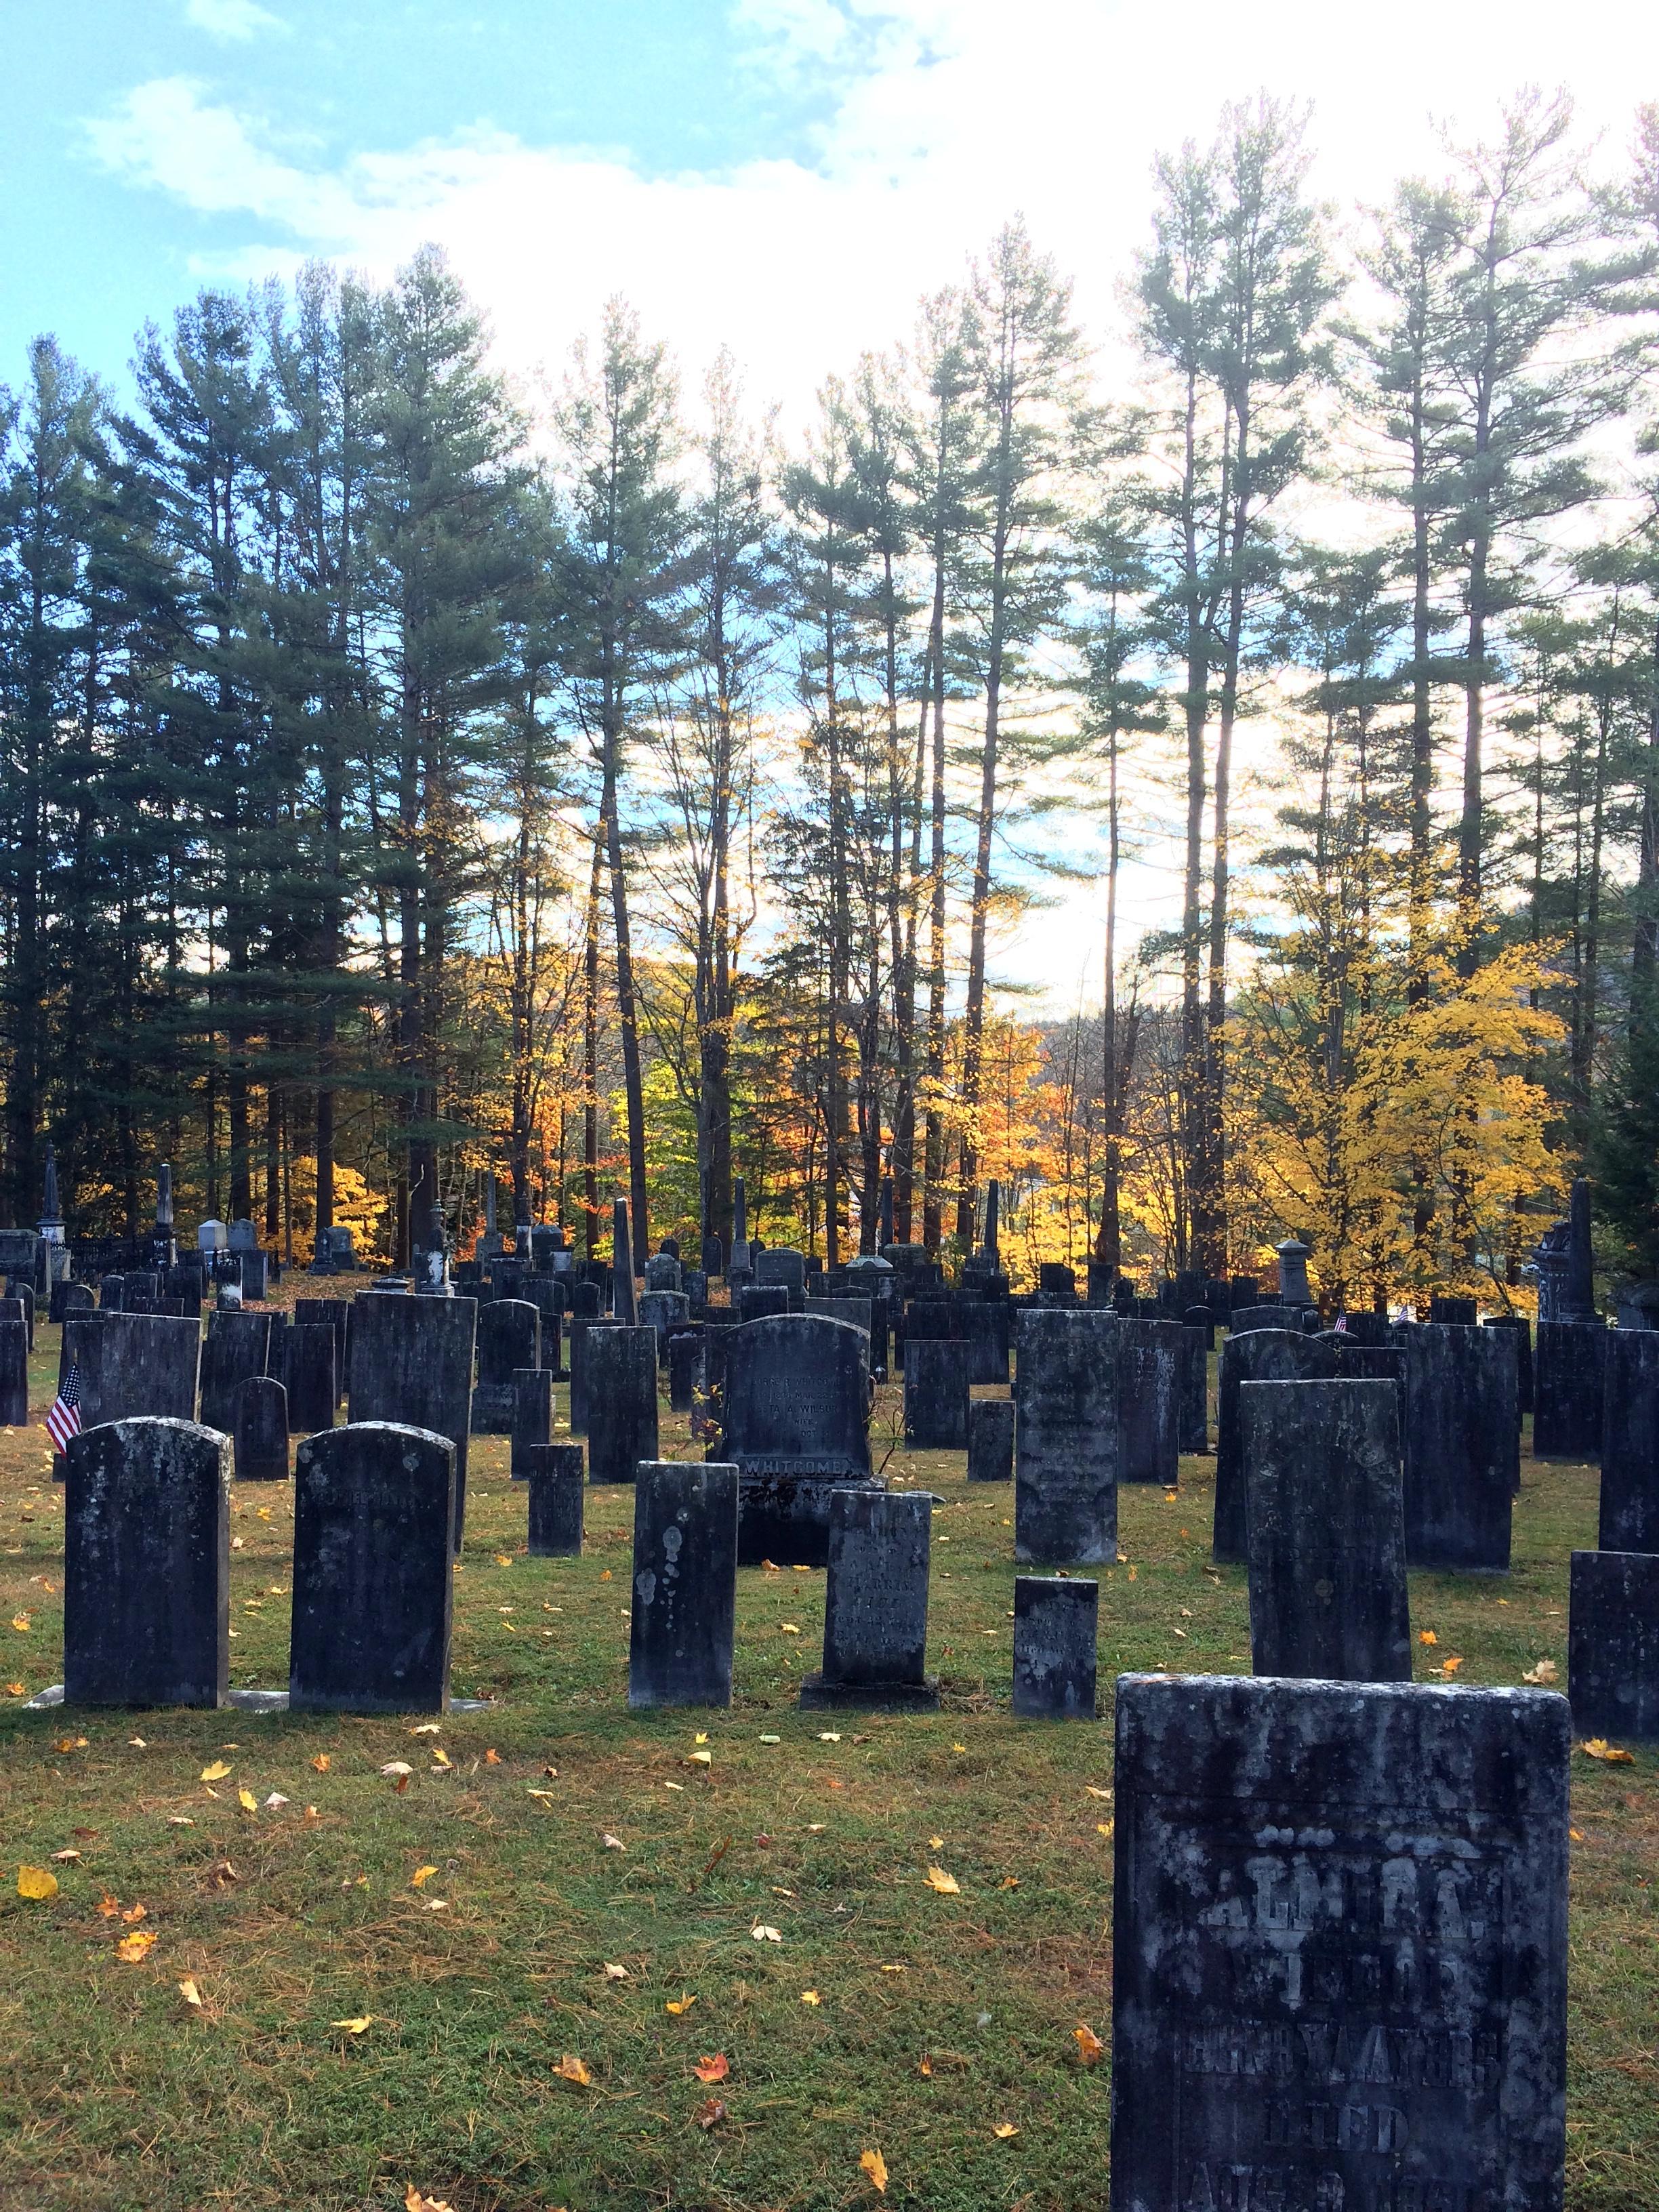 The graveyard in Grafton, Vermont